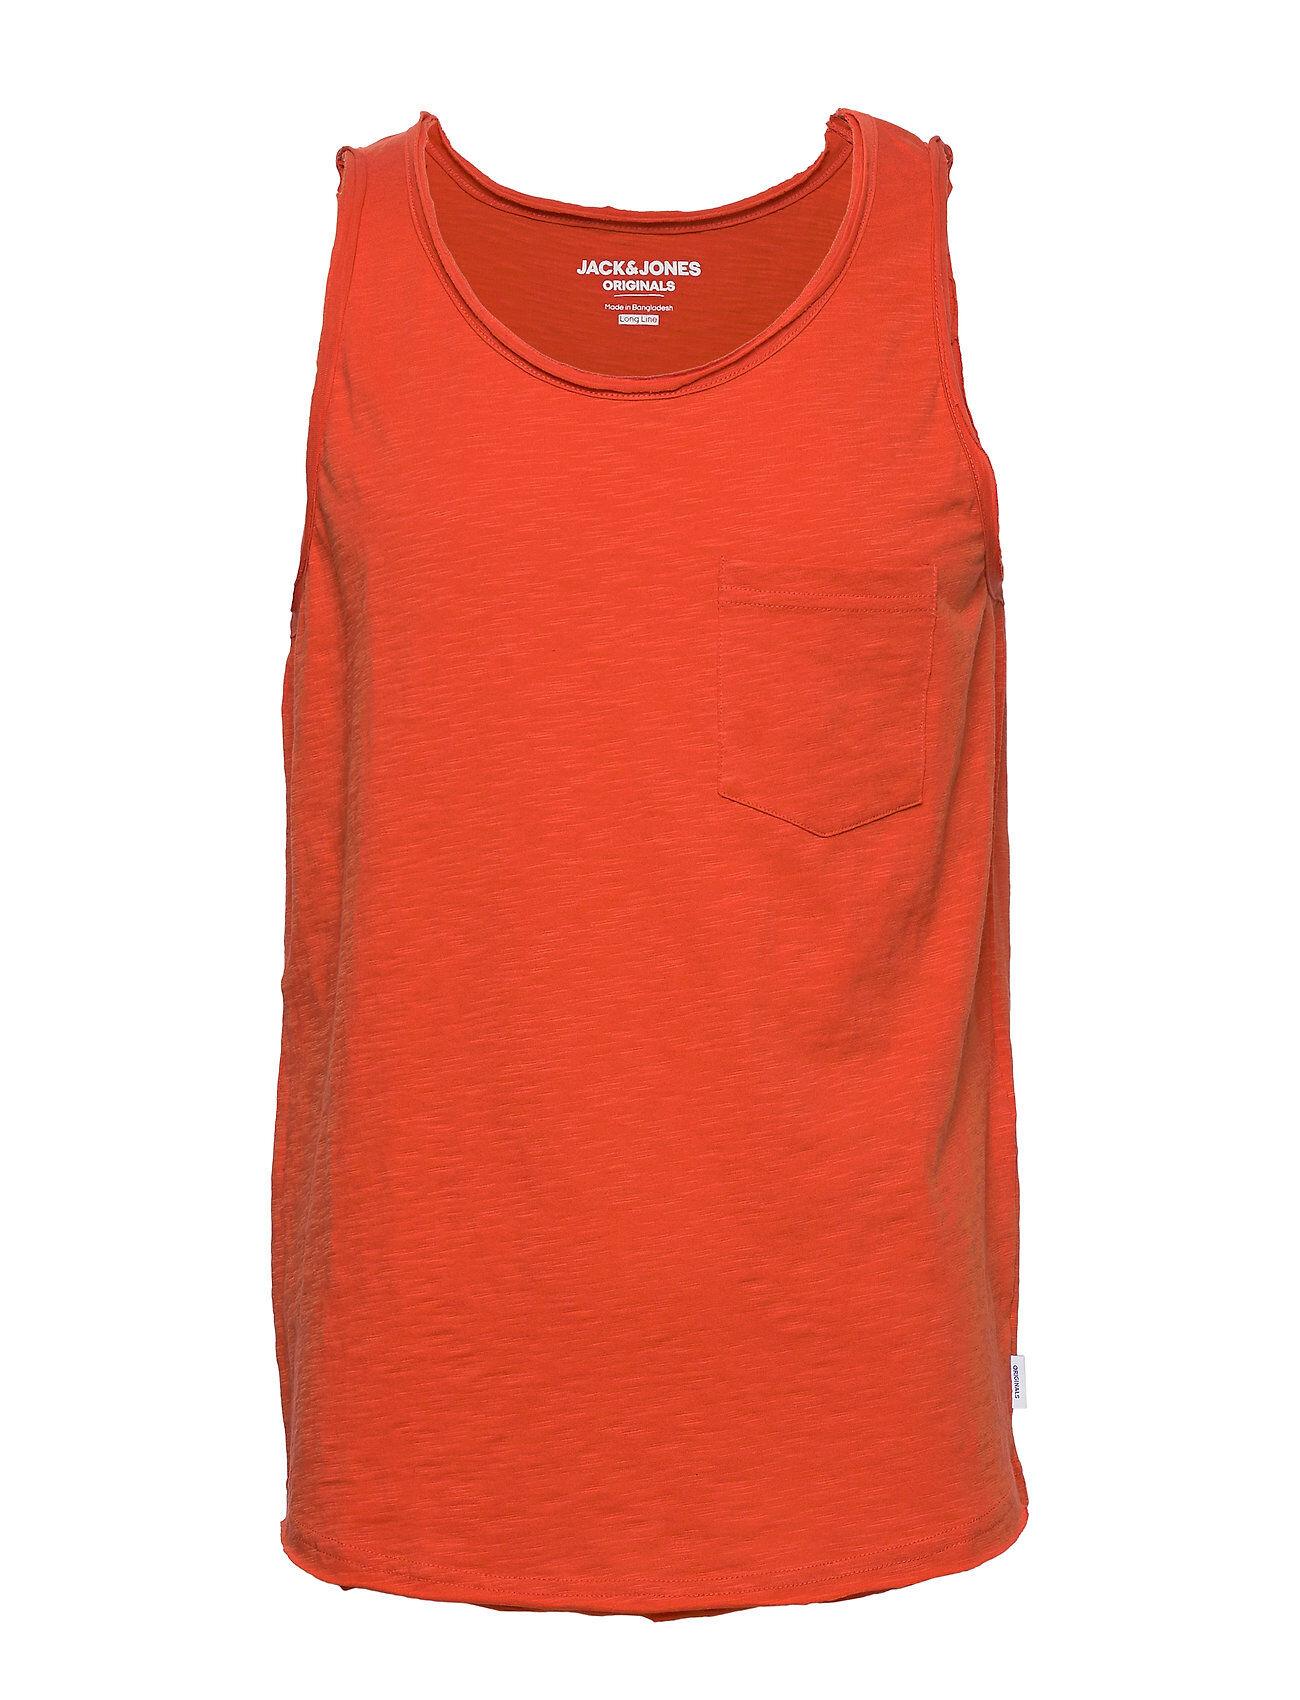 Jack & Jones Jorwallet Tank Top Sts T-shirts Sleeveless Punainen Jack & J S